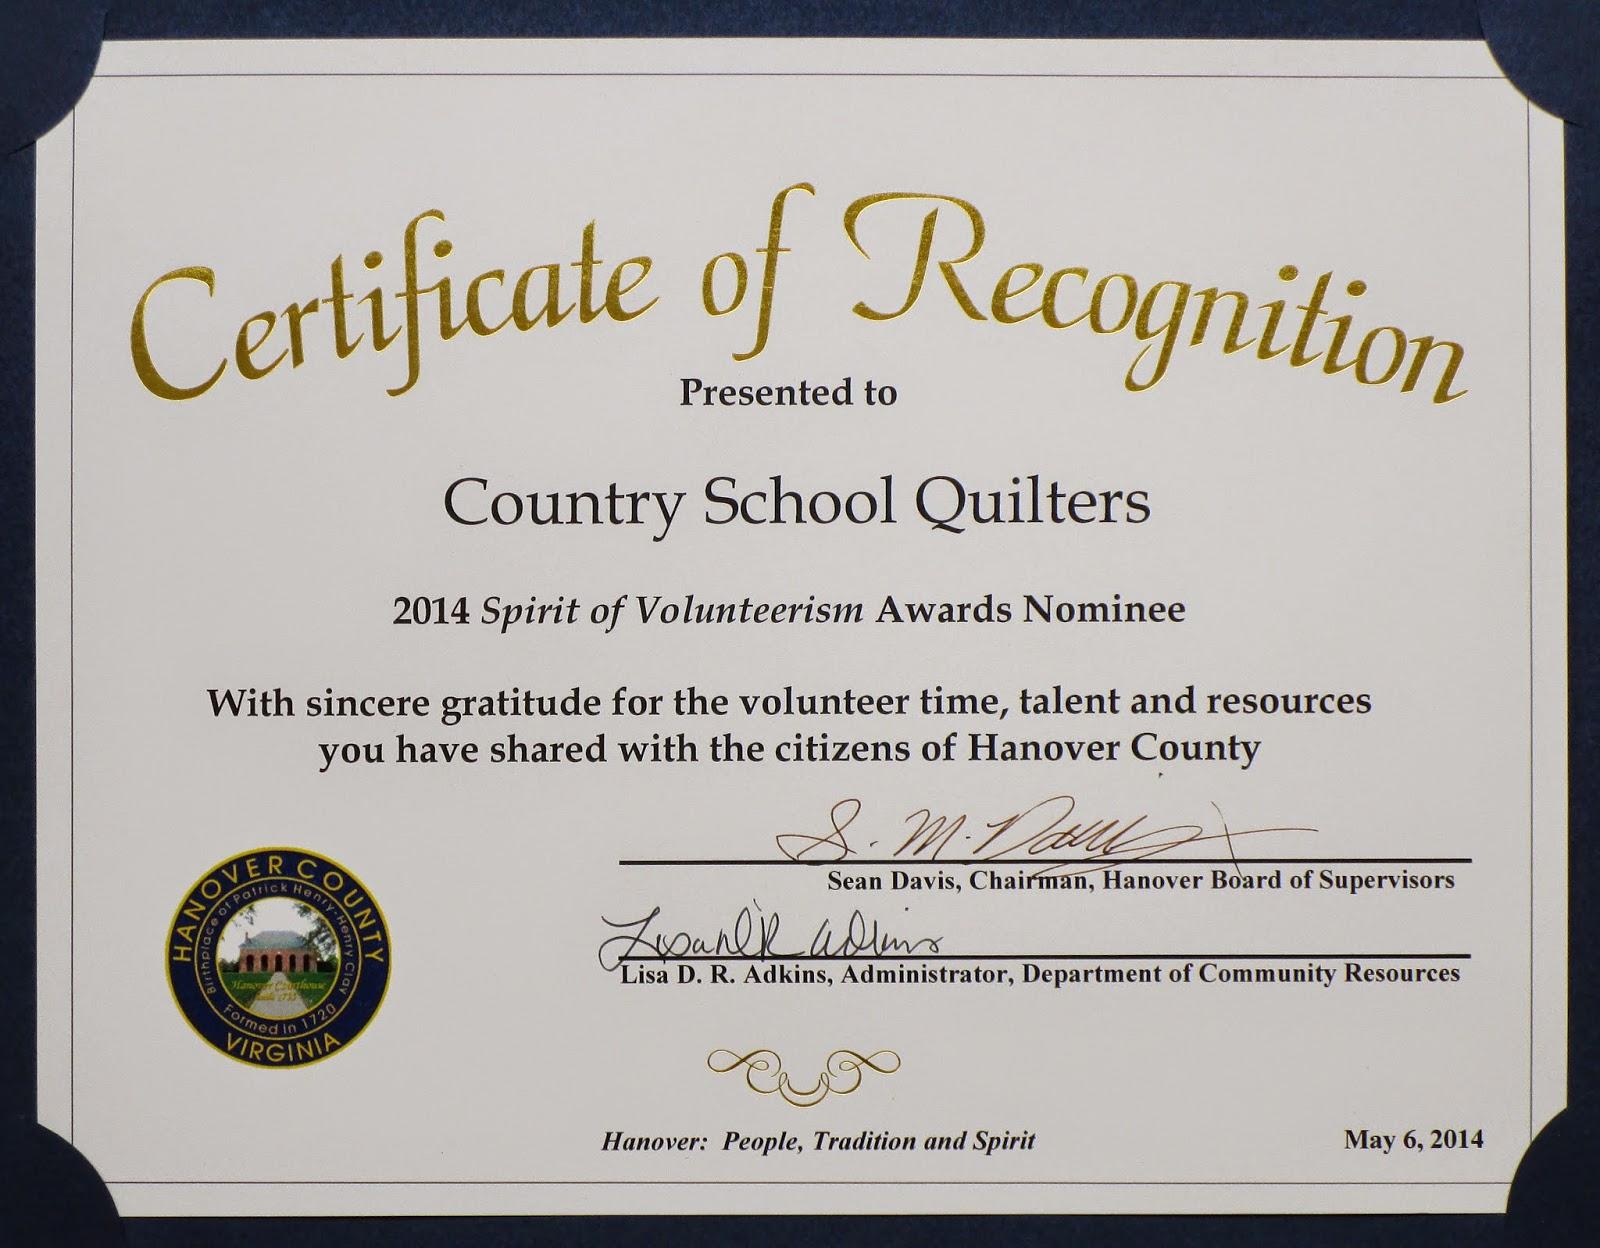 SEC Community Service Award winners |Christian Community Service Award